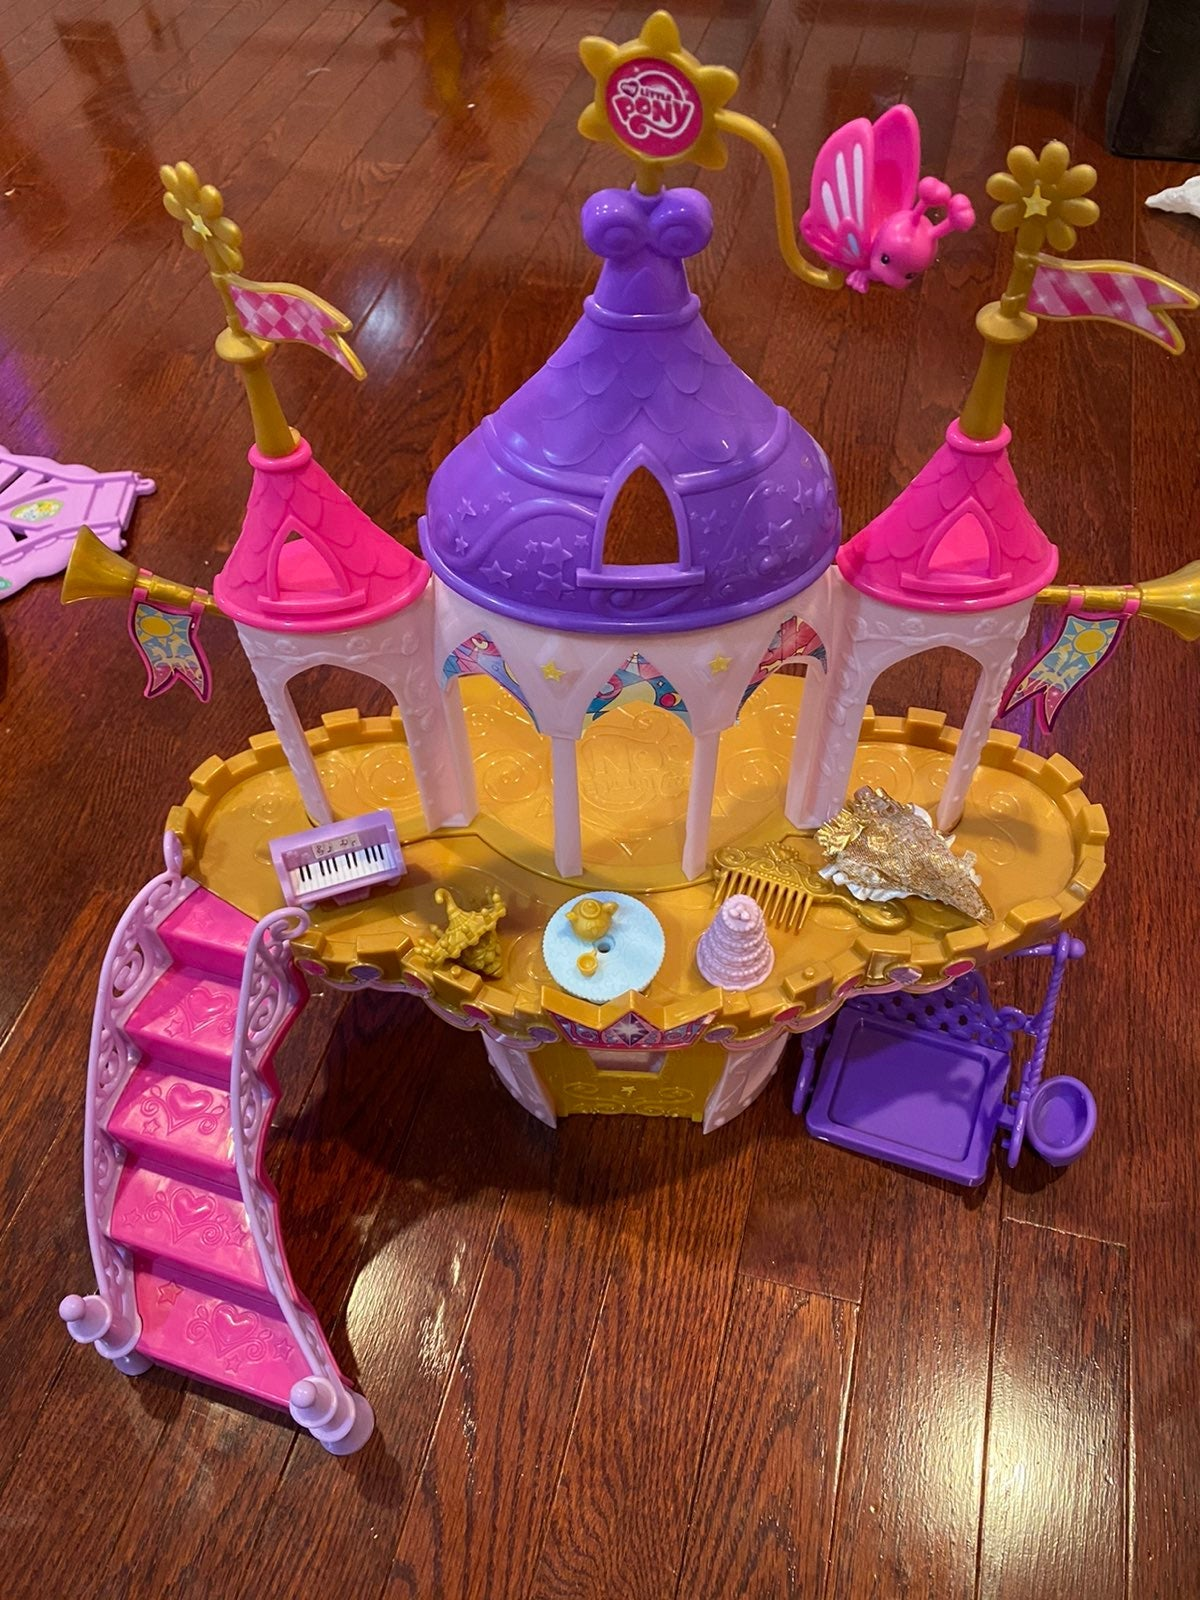 My Little Pony Wedding Castle Playset